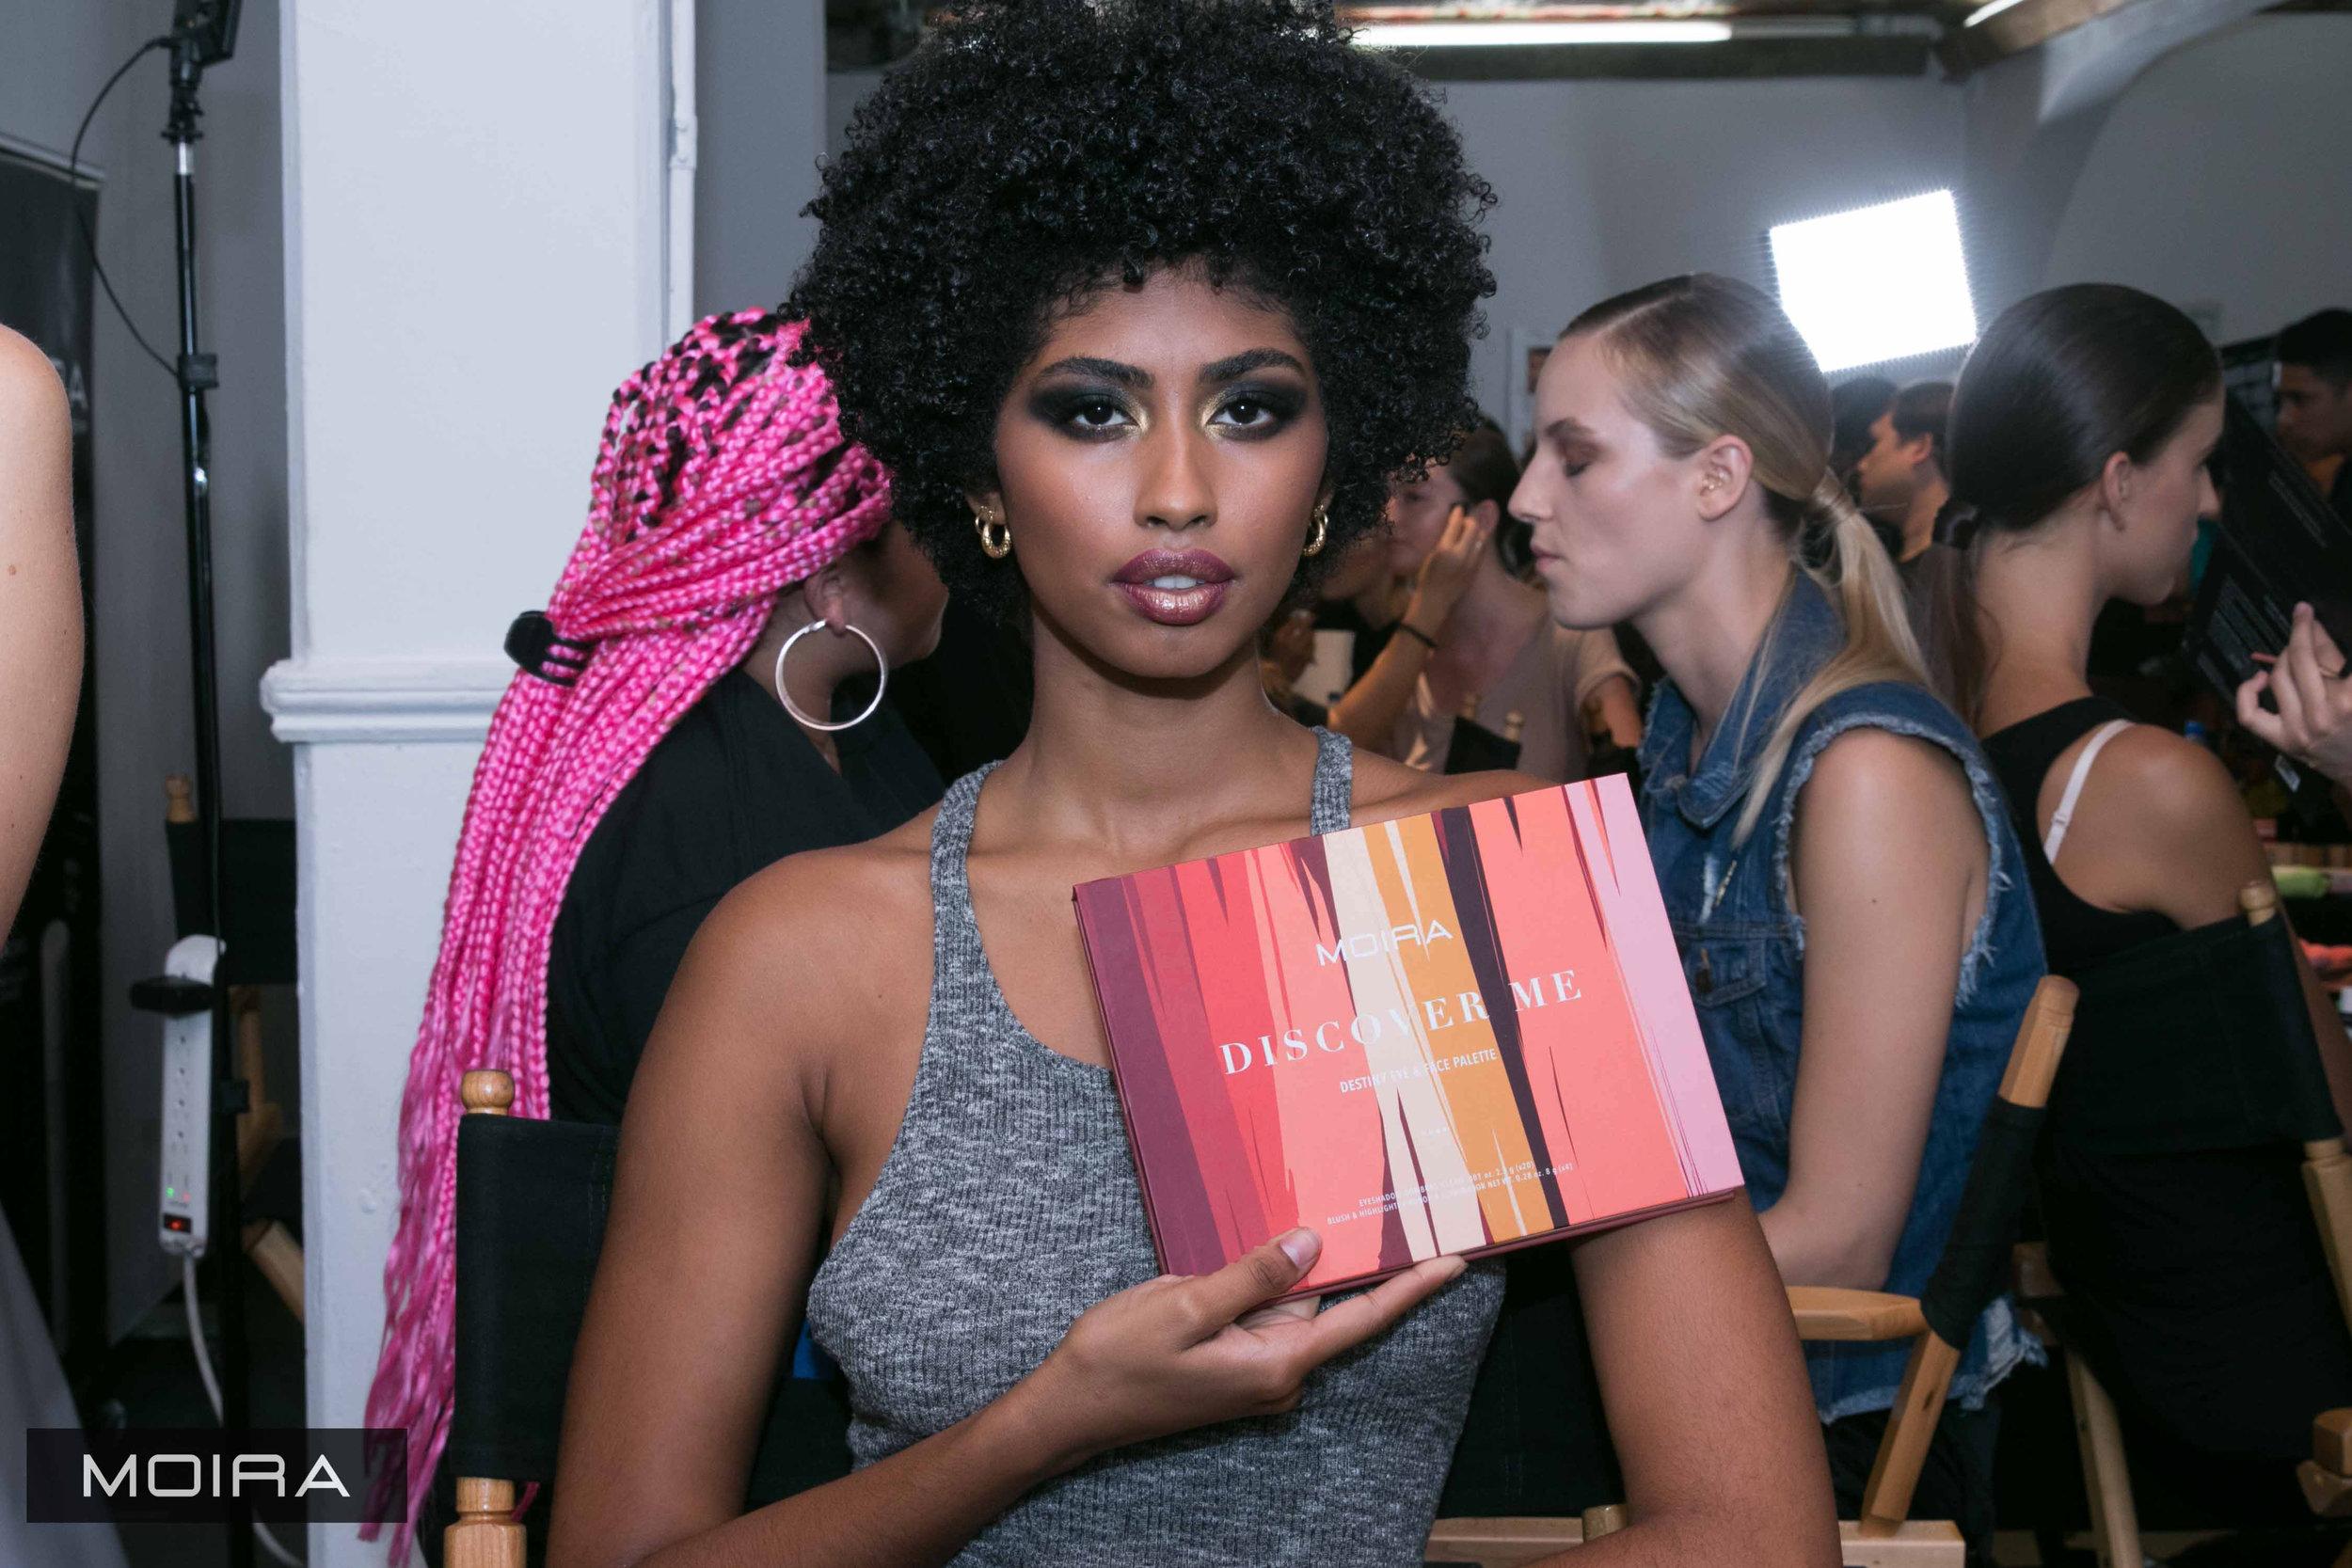 MOIRA_Cosmetics_New_York_Fashion_Week_2018-16.jpg